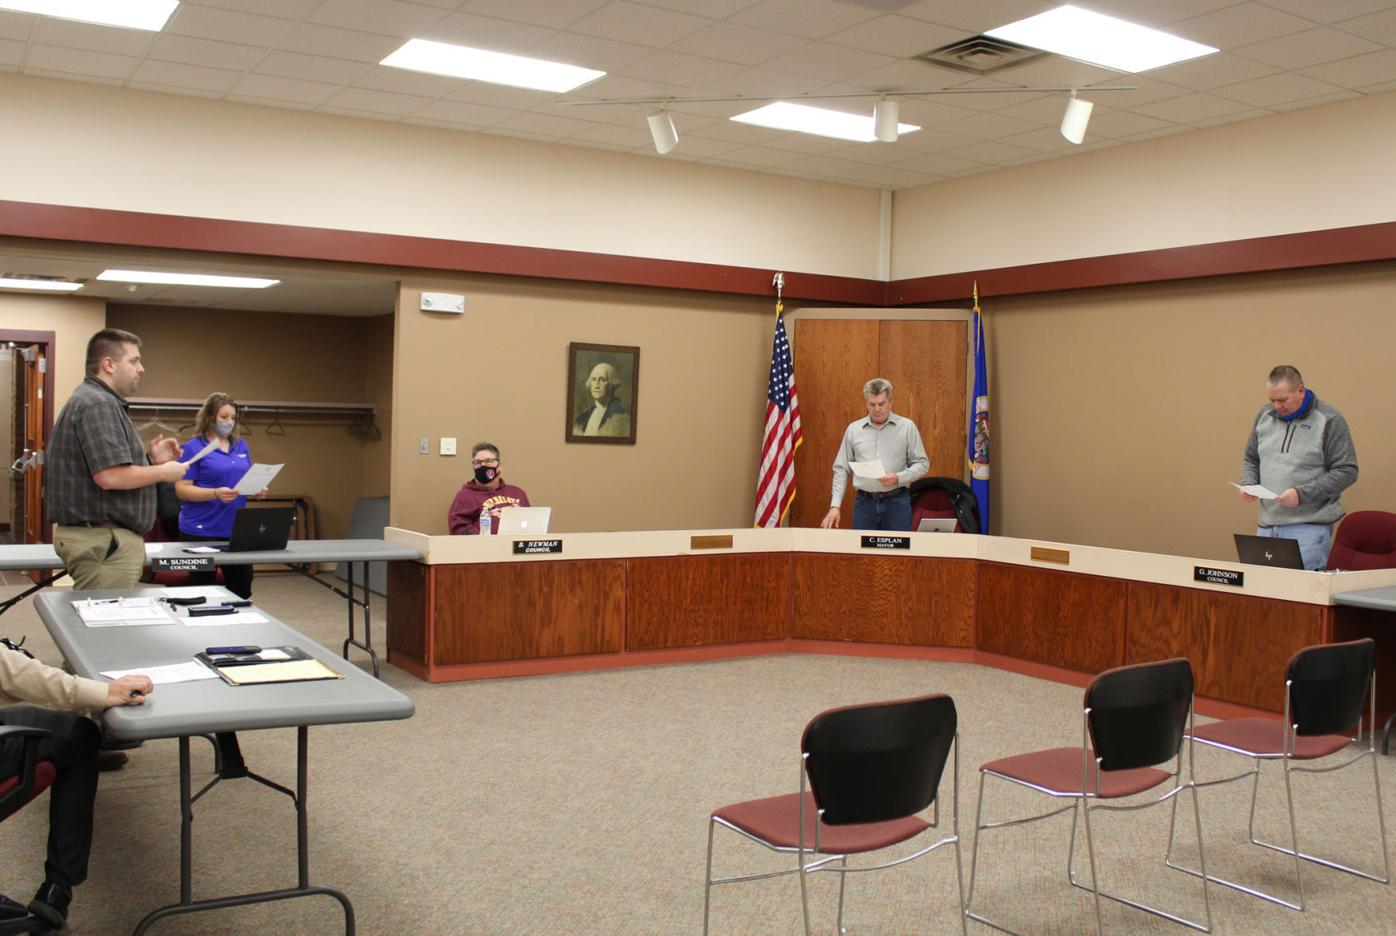 Blooming Prairie Council swears in Sundine and Johnson